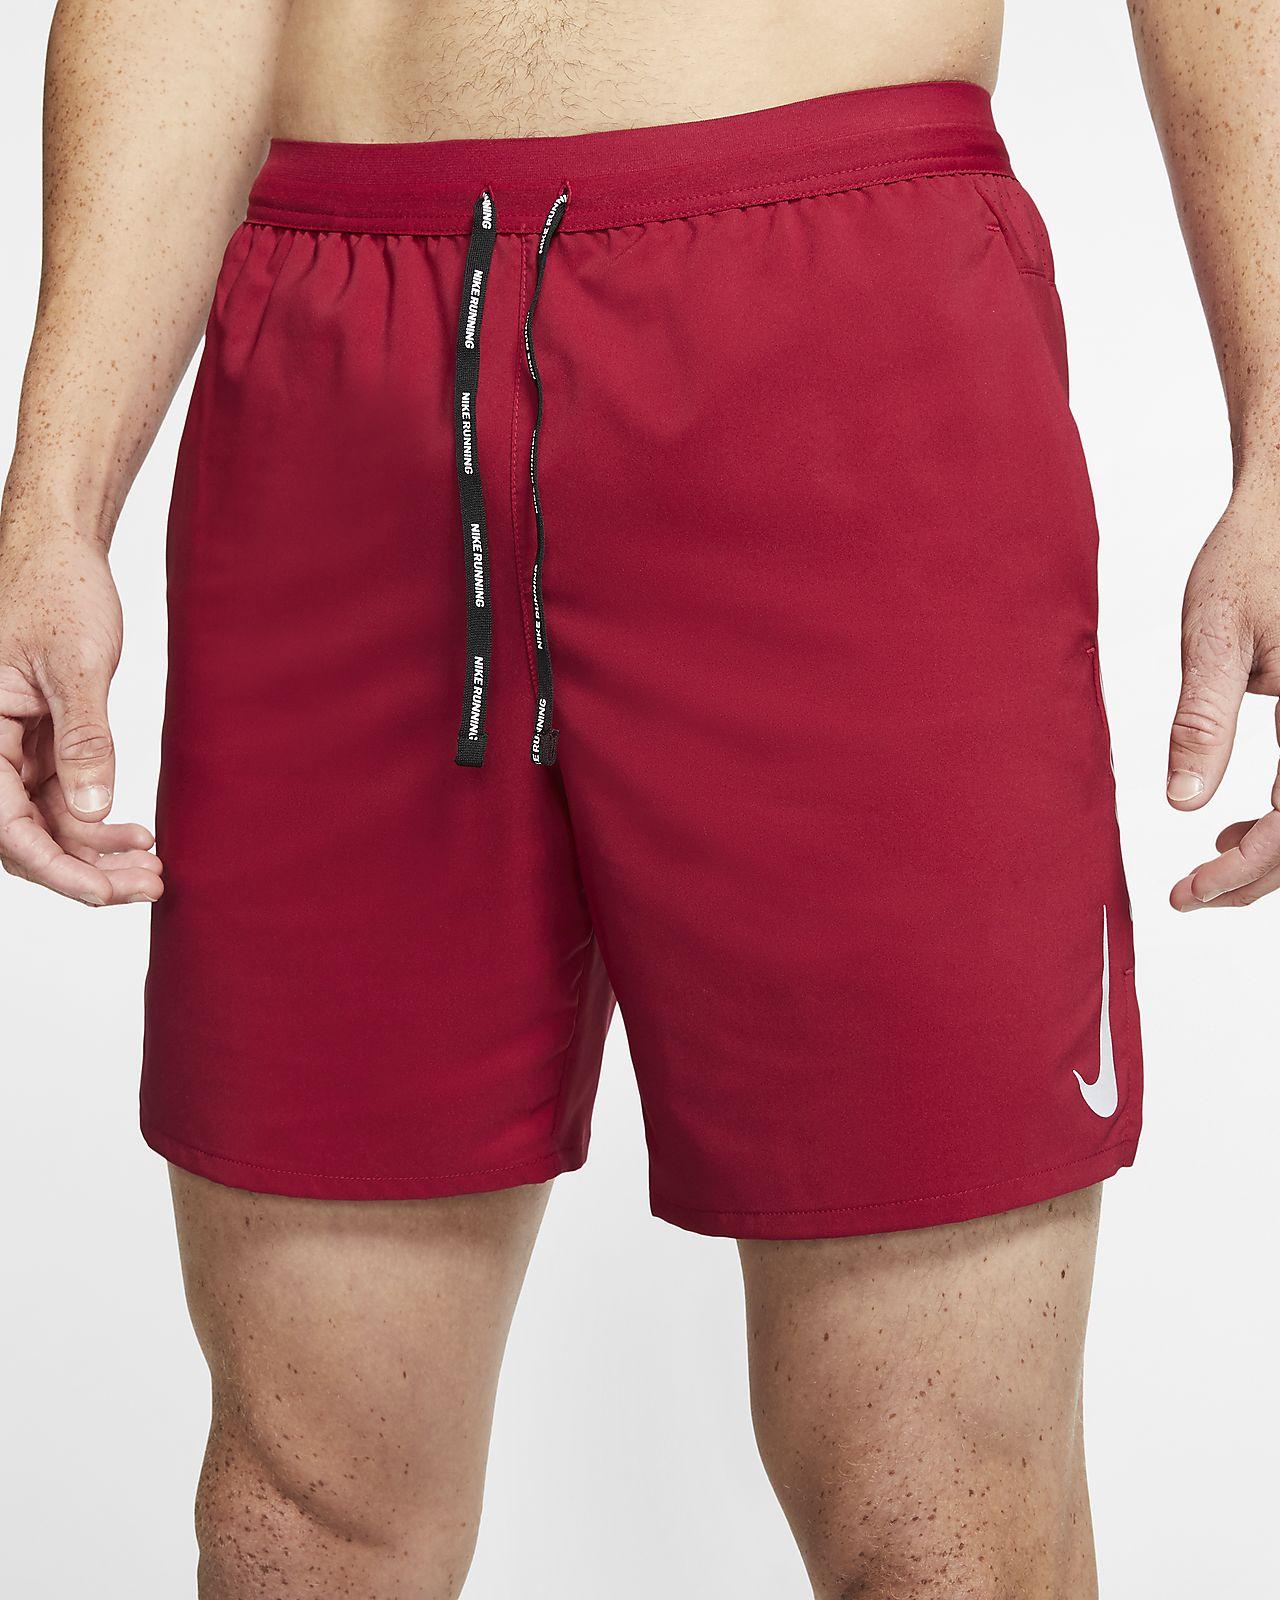 Nike Dri-FIT Flex Stride Men's 18cm (approx.) 2-in-1 Running Shorts